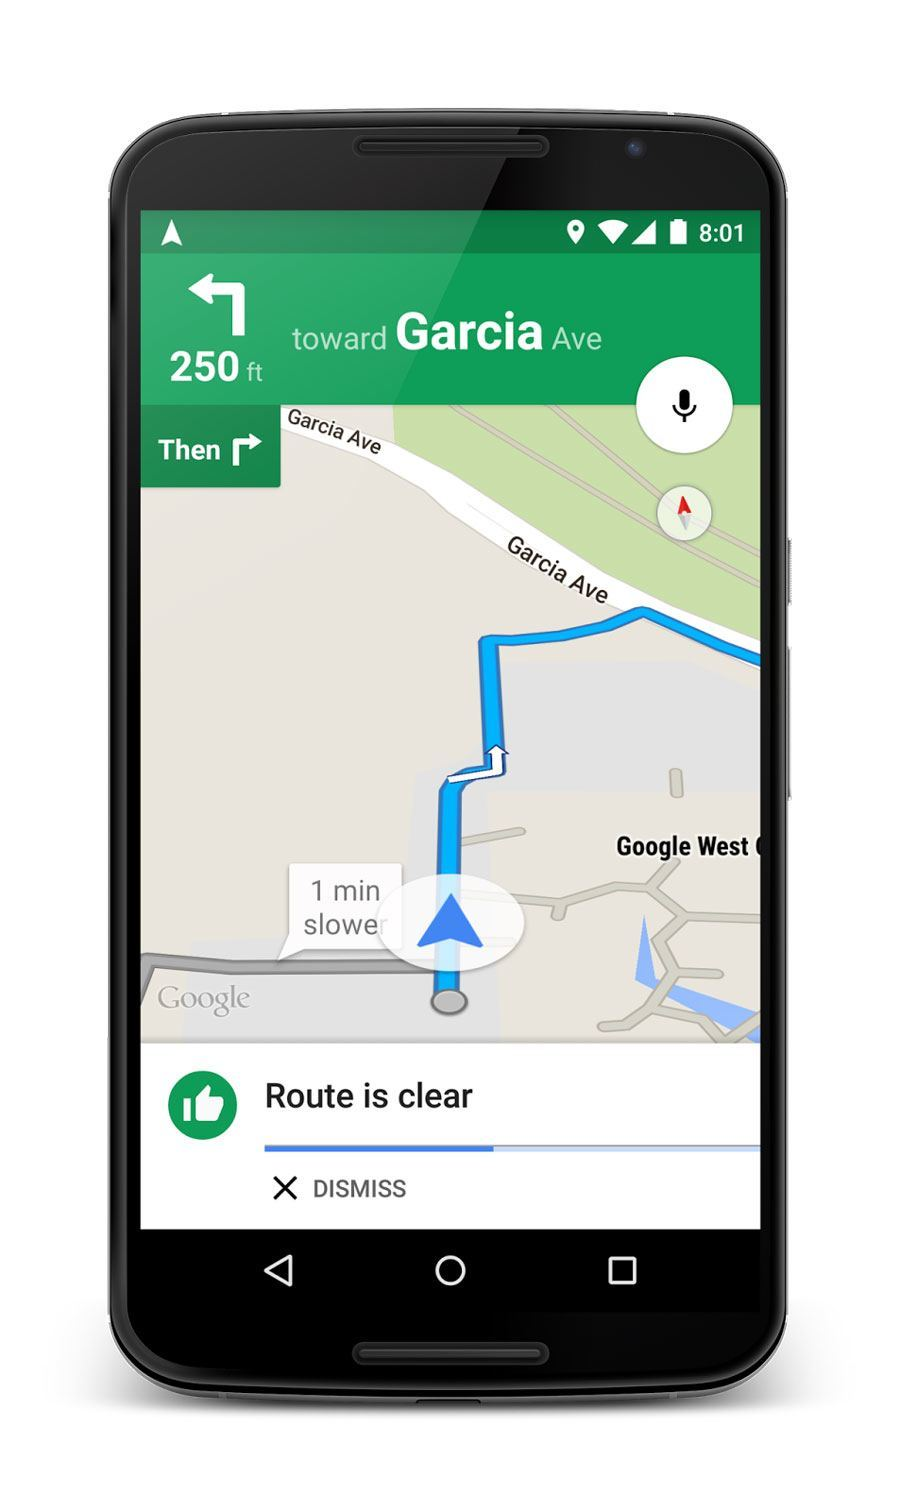 Technik_Google_Maps_App_Phone_Shot_1